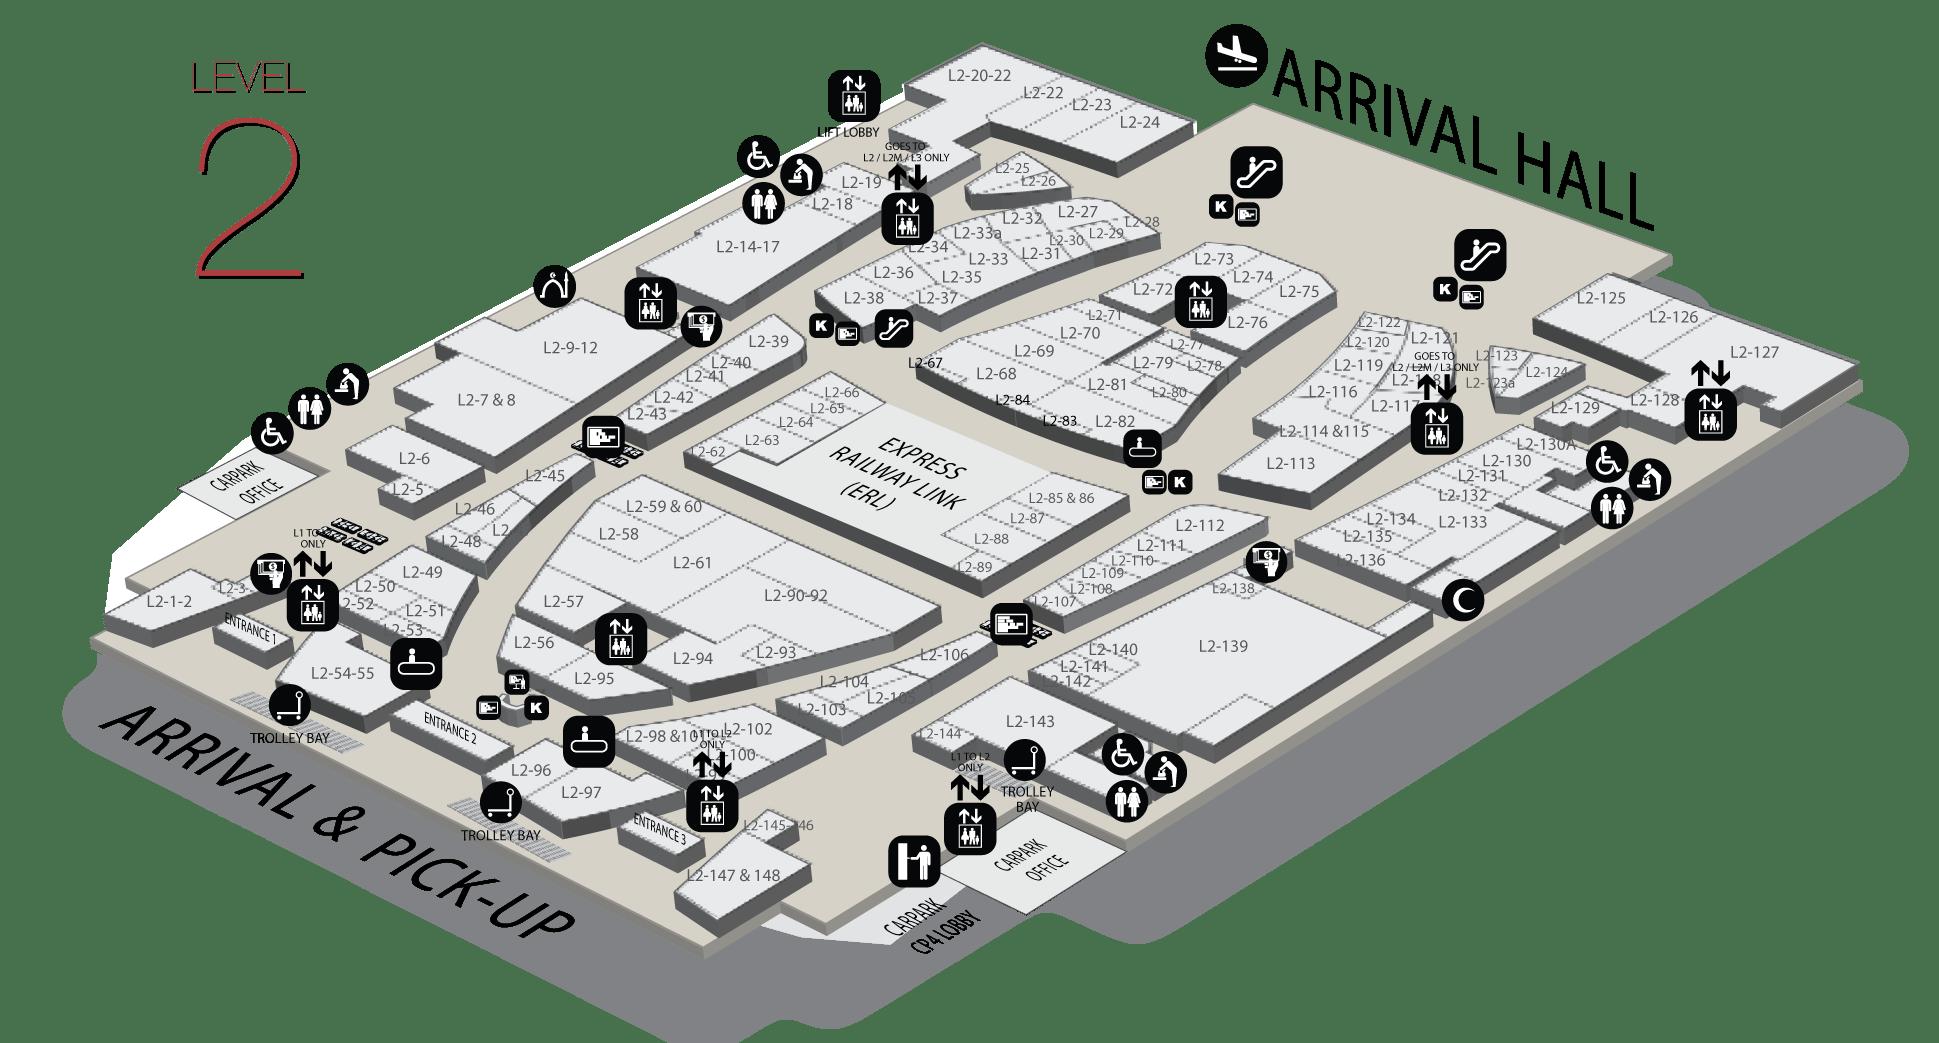 hight resolution of gateway klia2 level 2